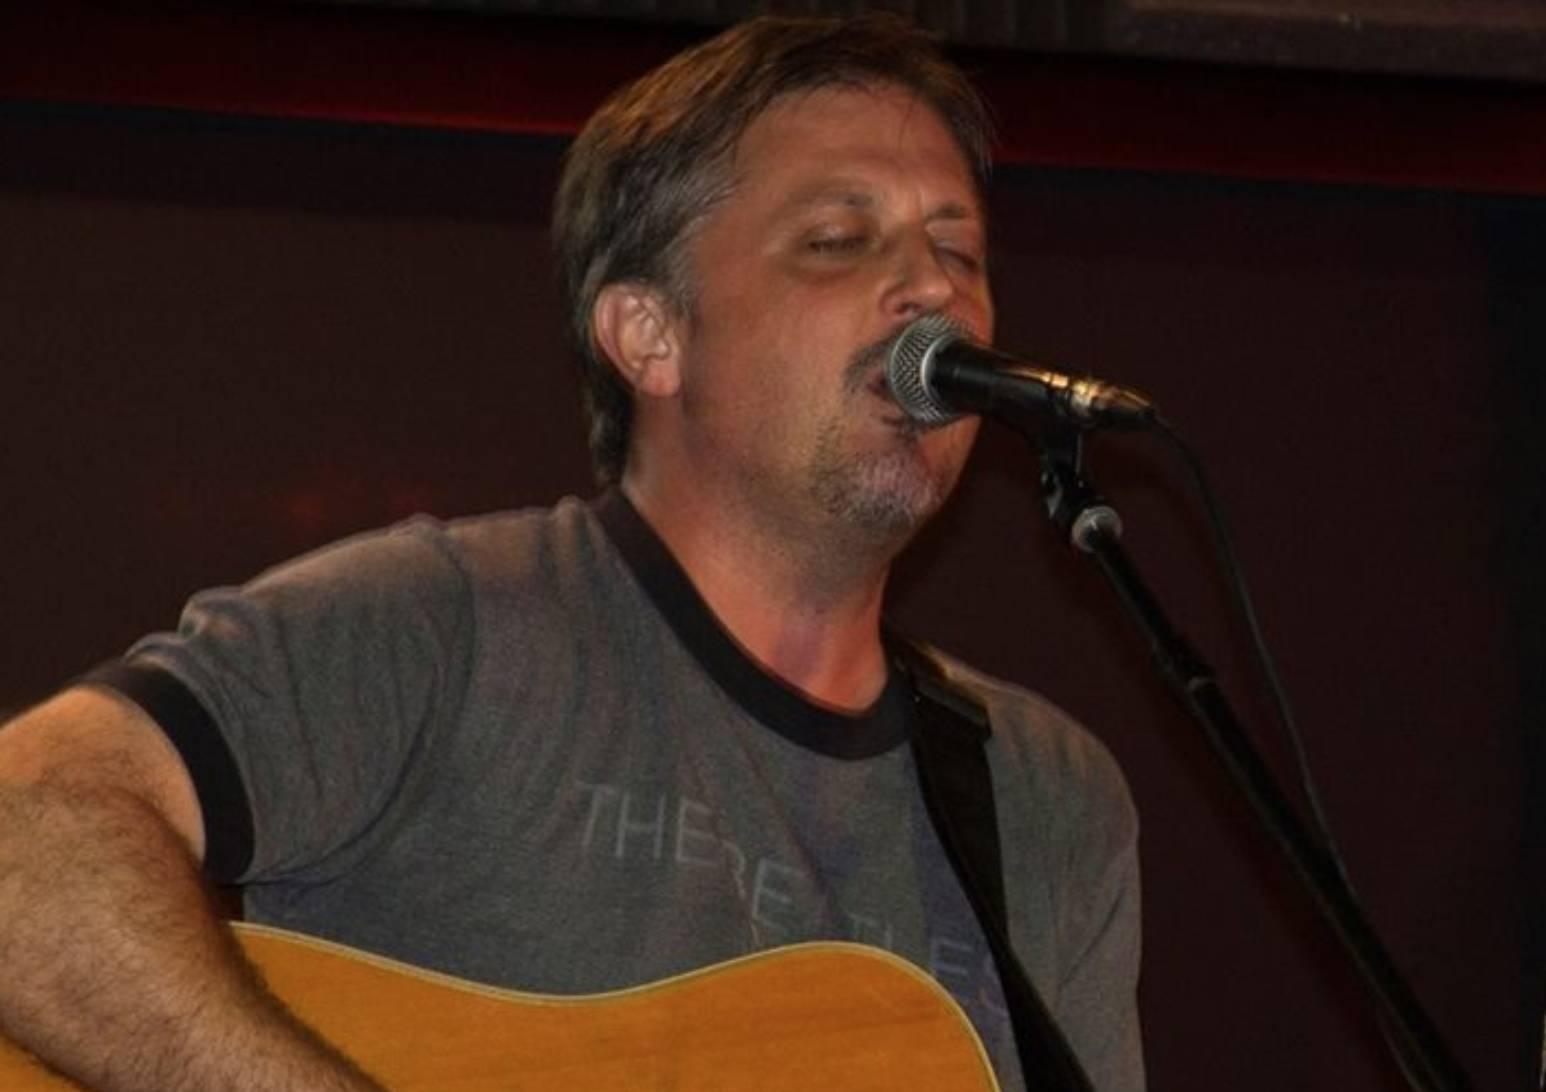 Live Music w/ Dwayne Beasley